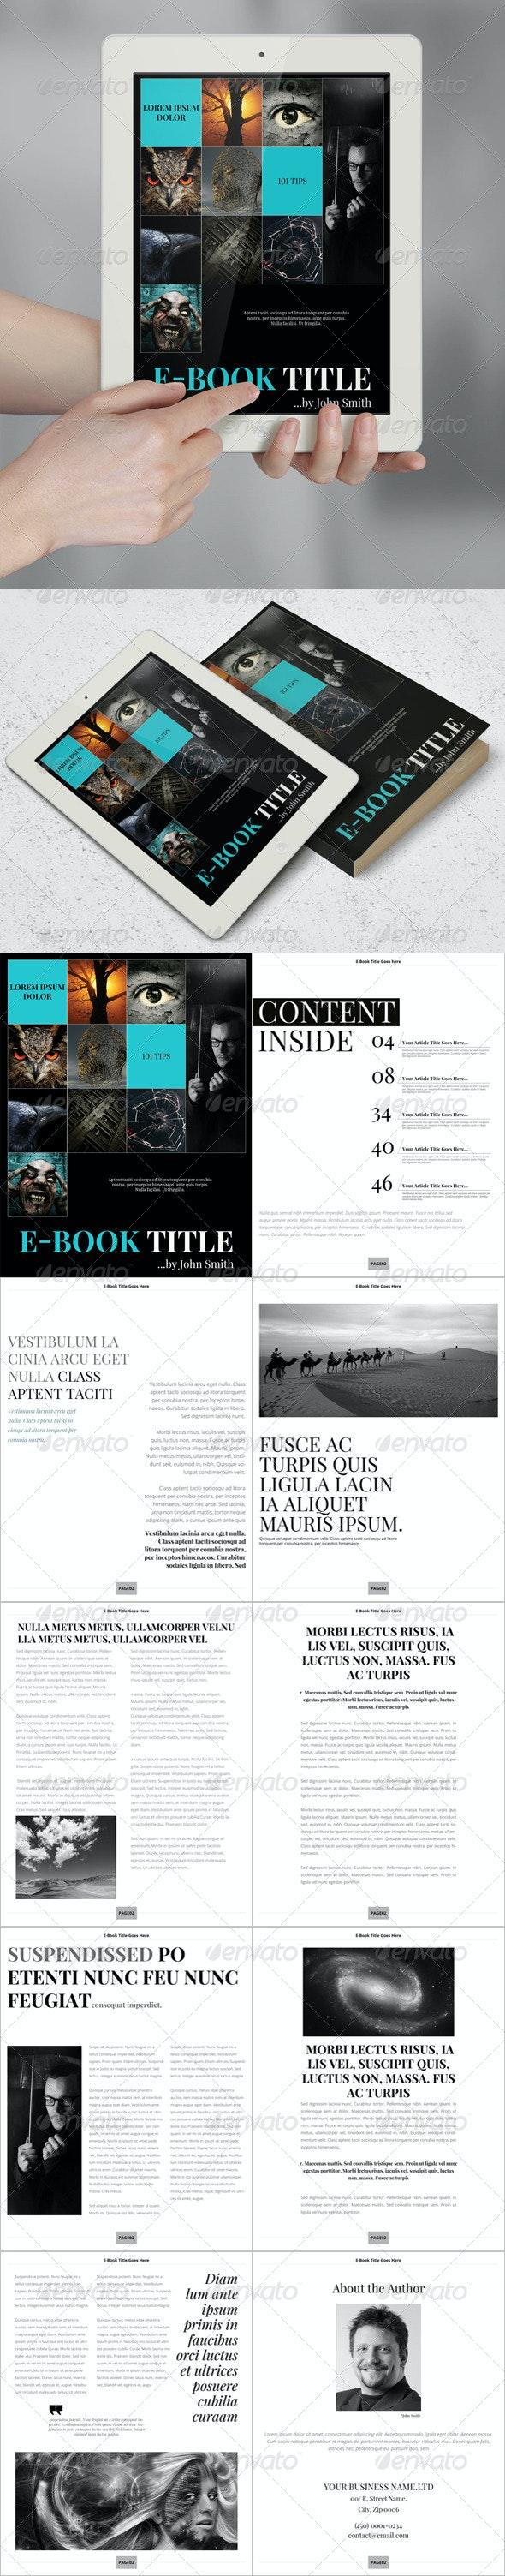 E-Book Template - Digital Books ePublishing